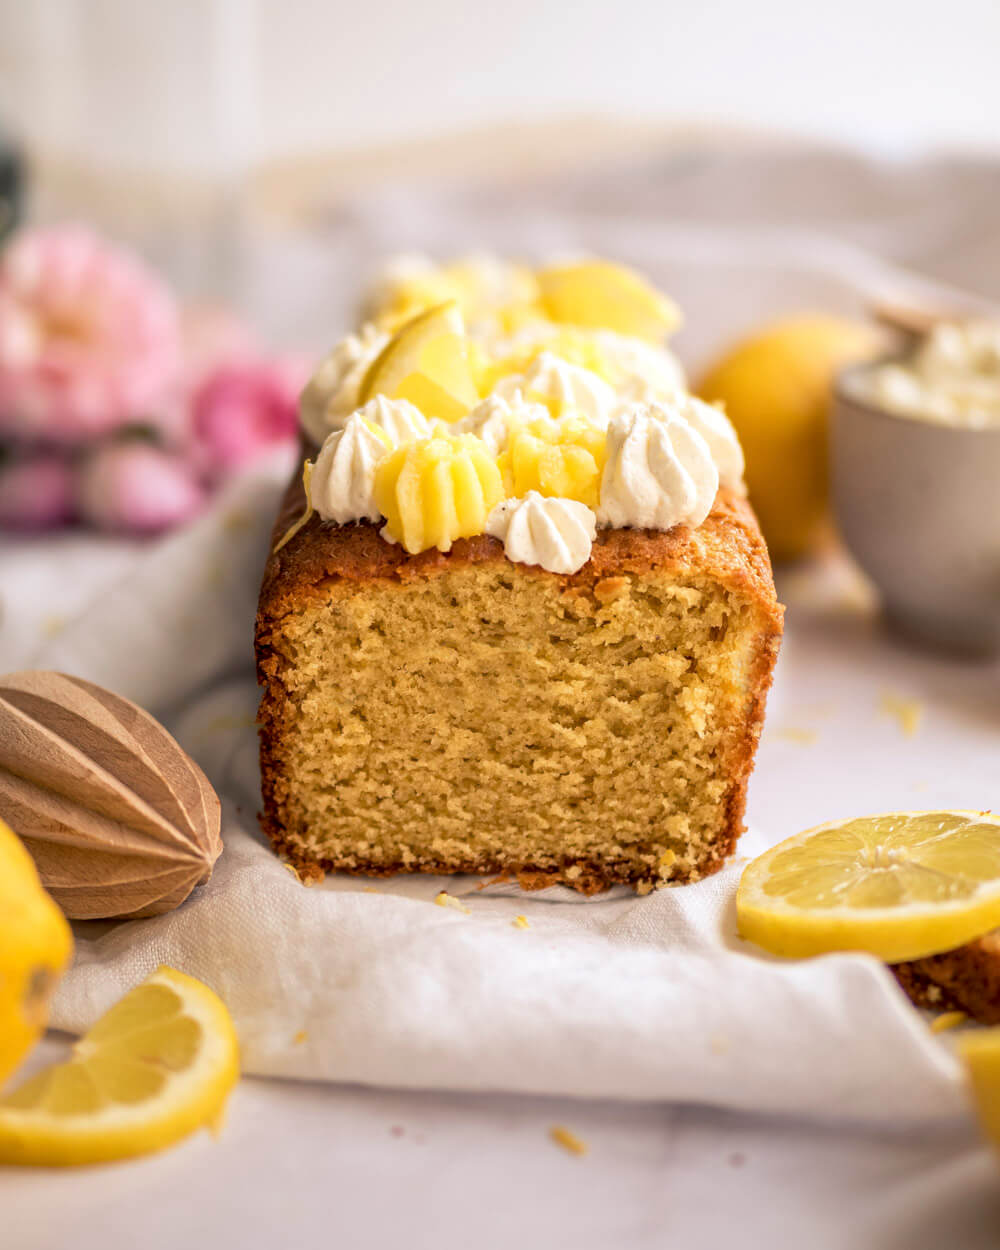 cake au citron et au mascarpone, lemon curd, chantilly mascarpone